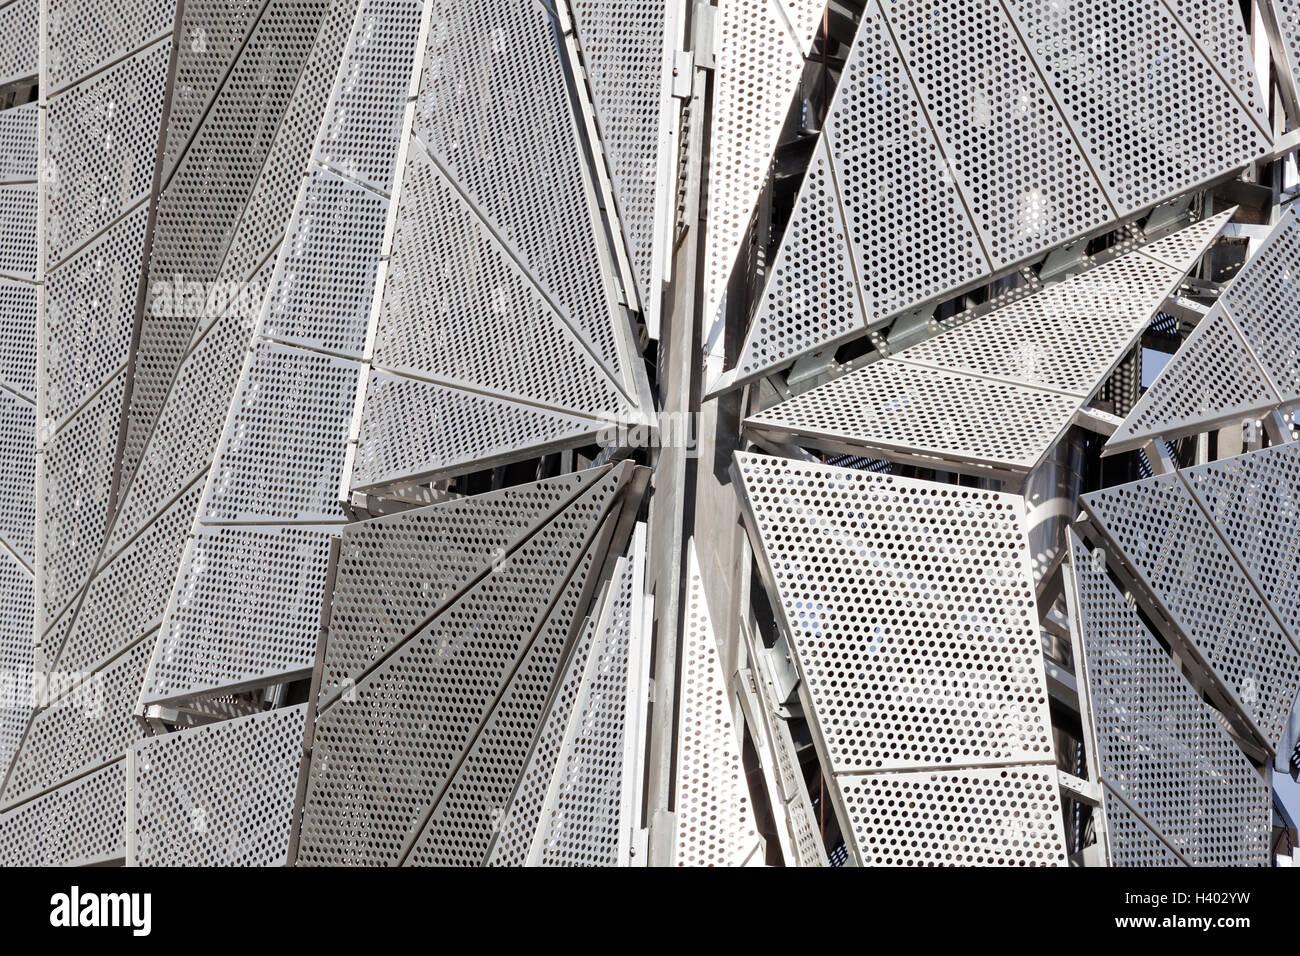 The Optic Cloak, Greenwich Peninsula, London. Exterior detail of aluminium mesh cladding designed to camouflage - Stock Image